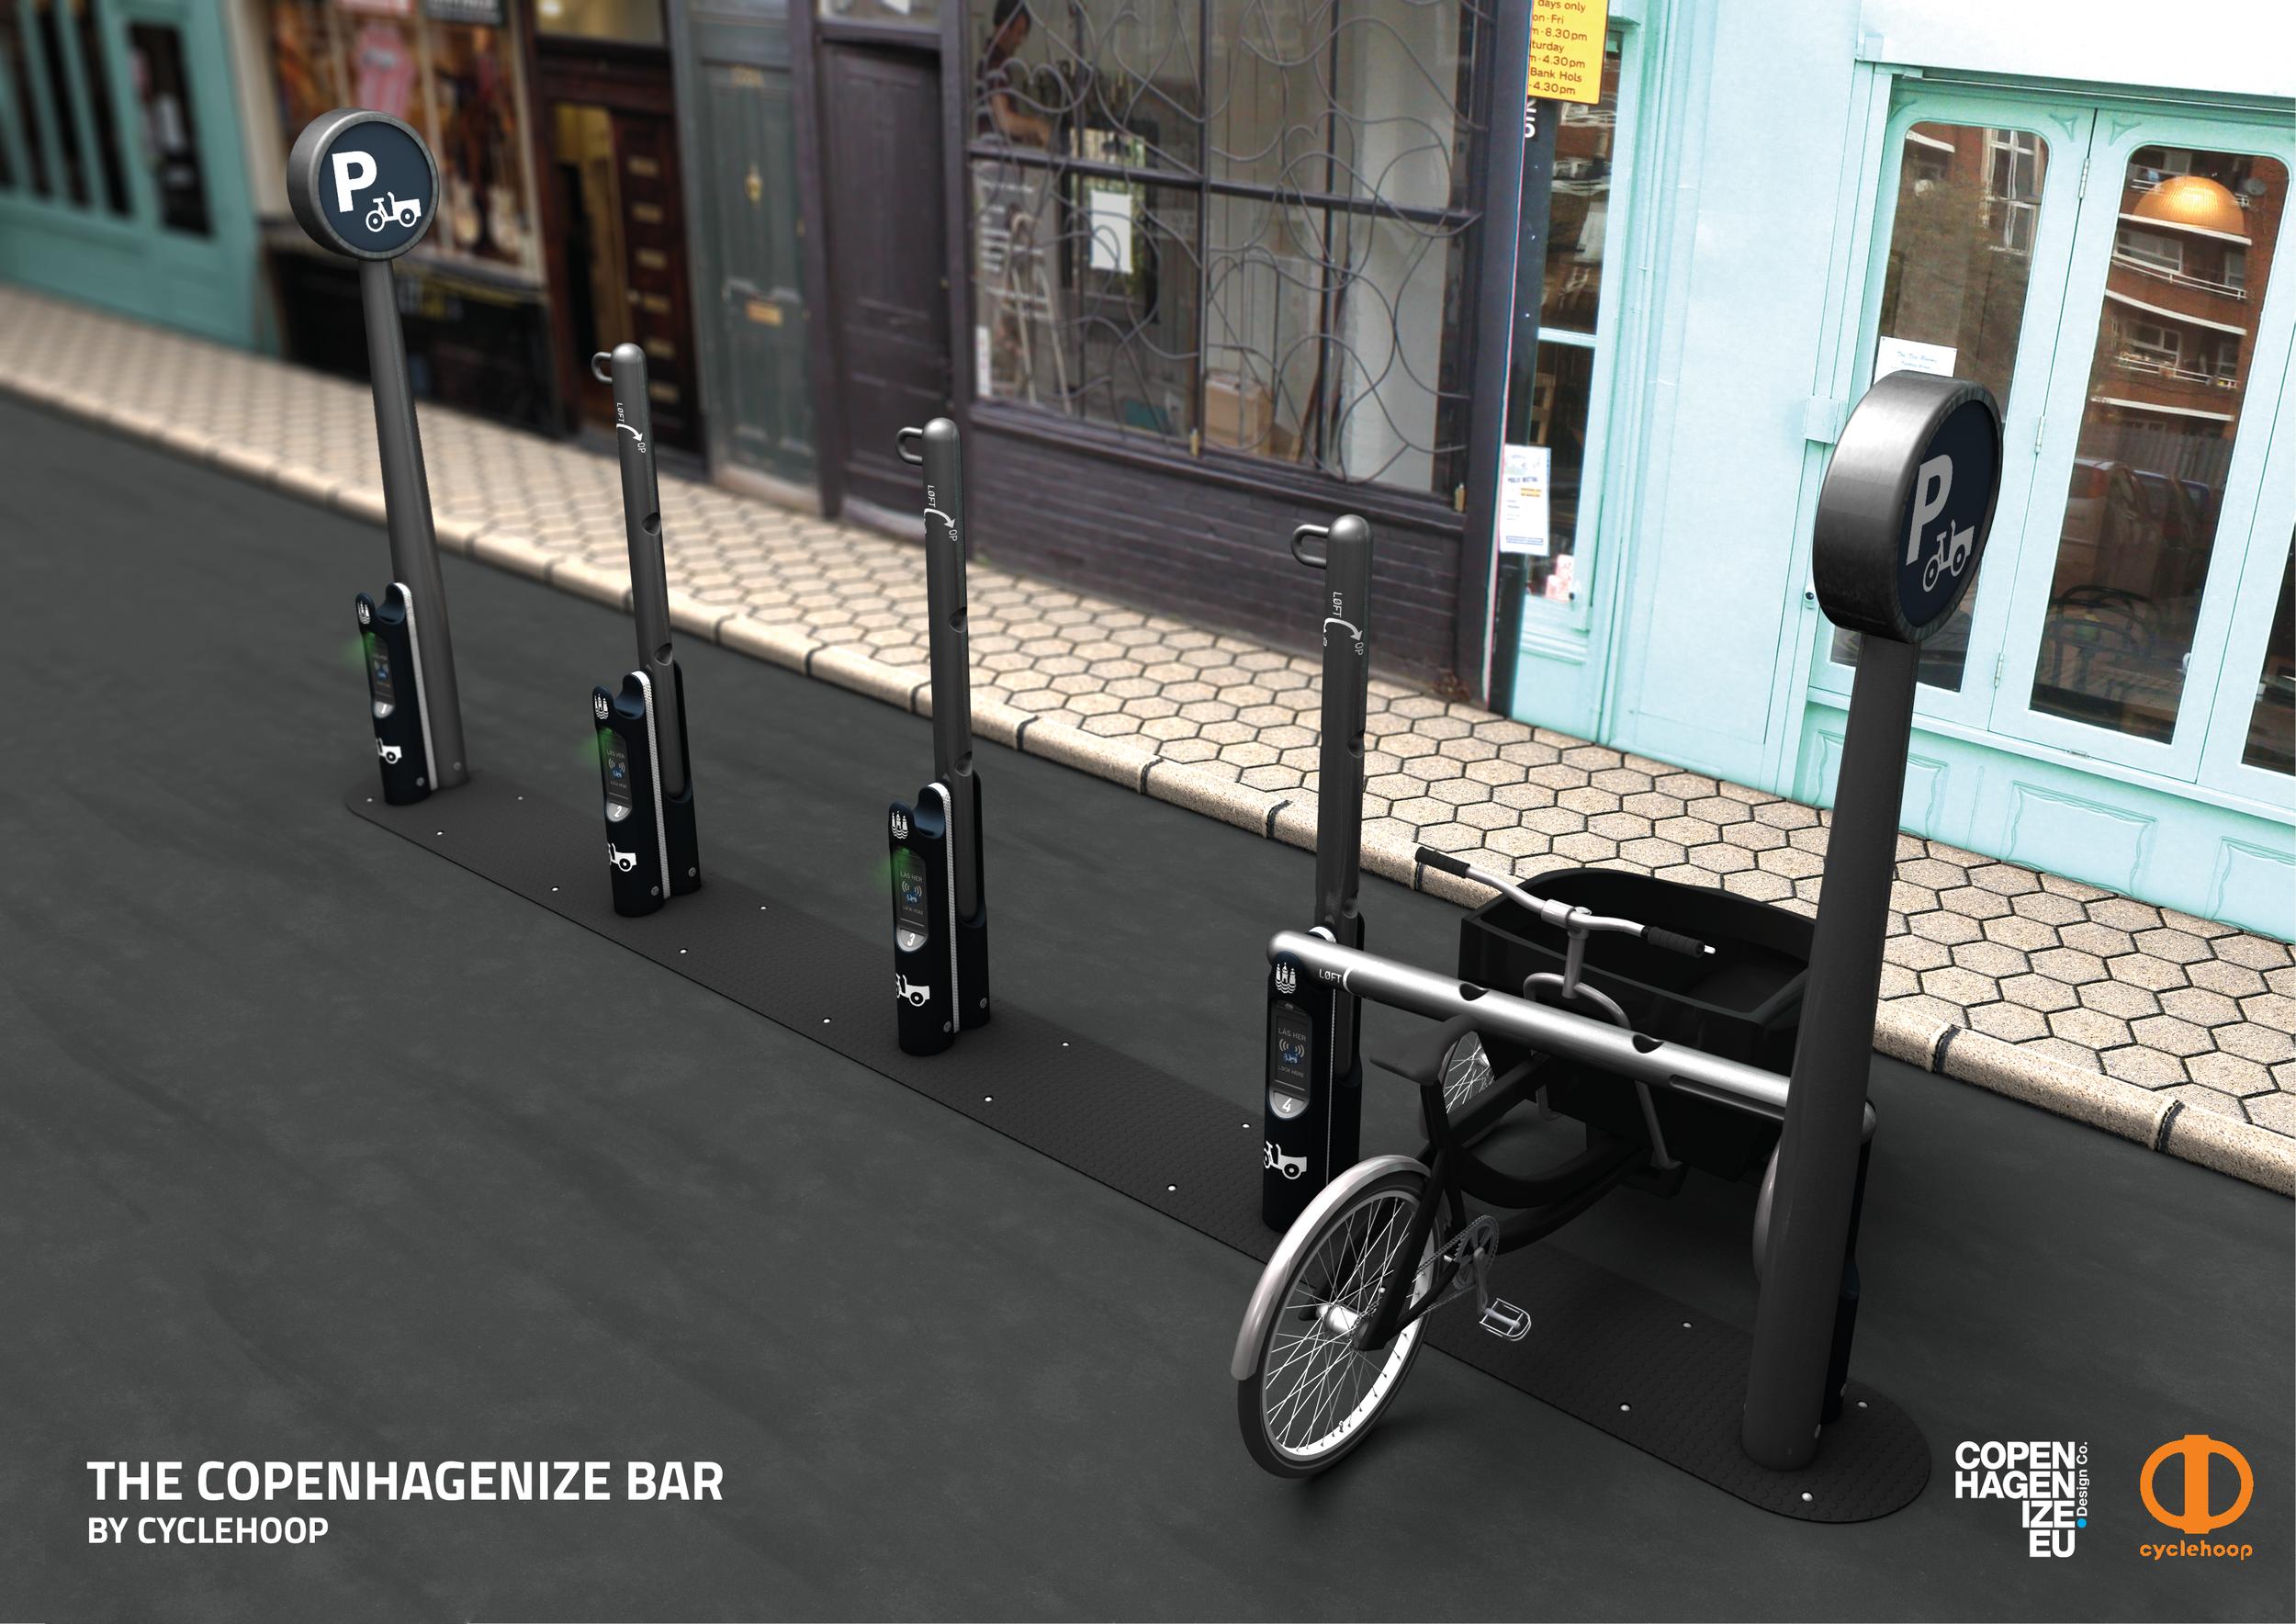 The Copenhagenize Bar - by Cyclehoop - // designing on-street cargo bike parking